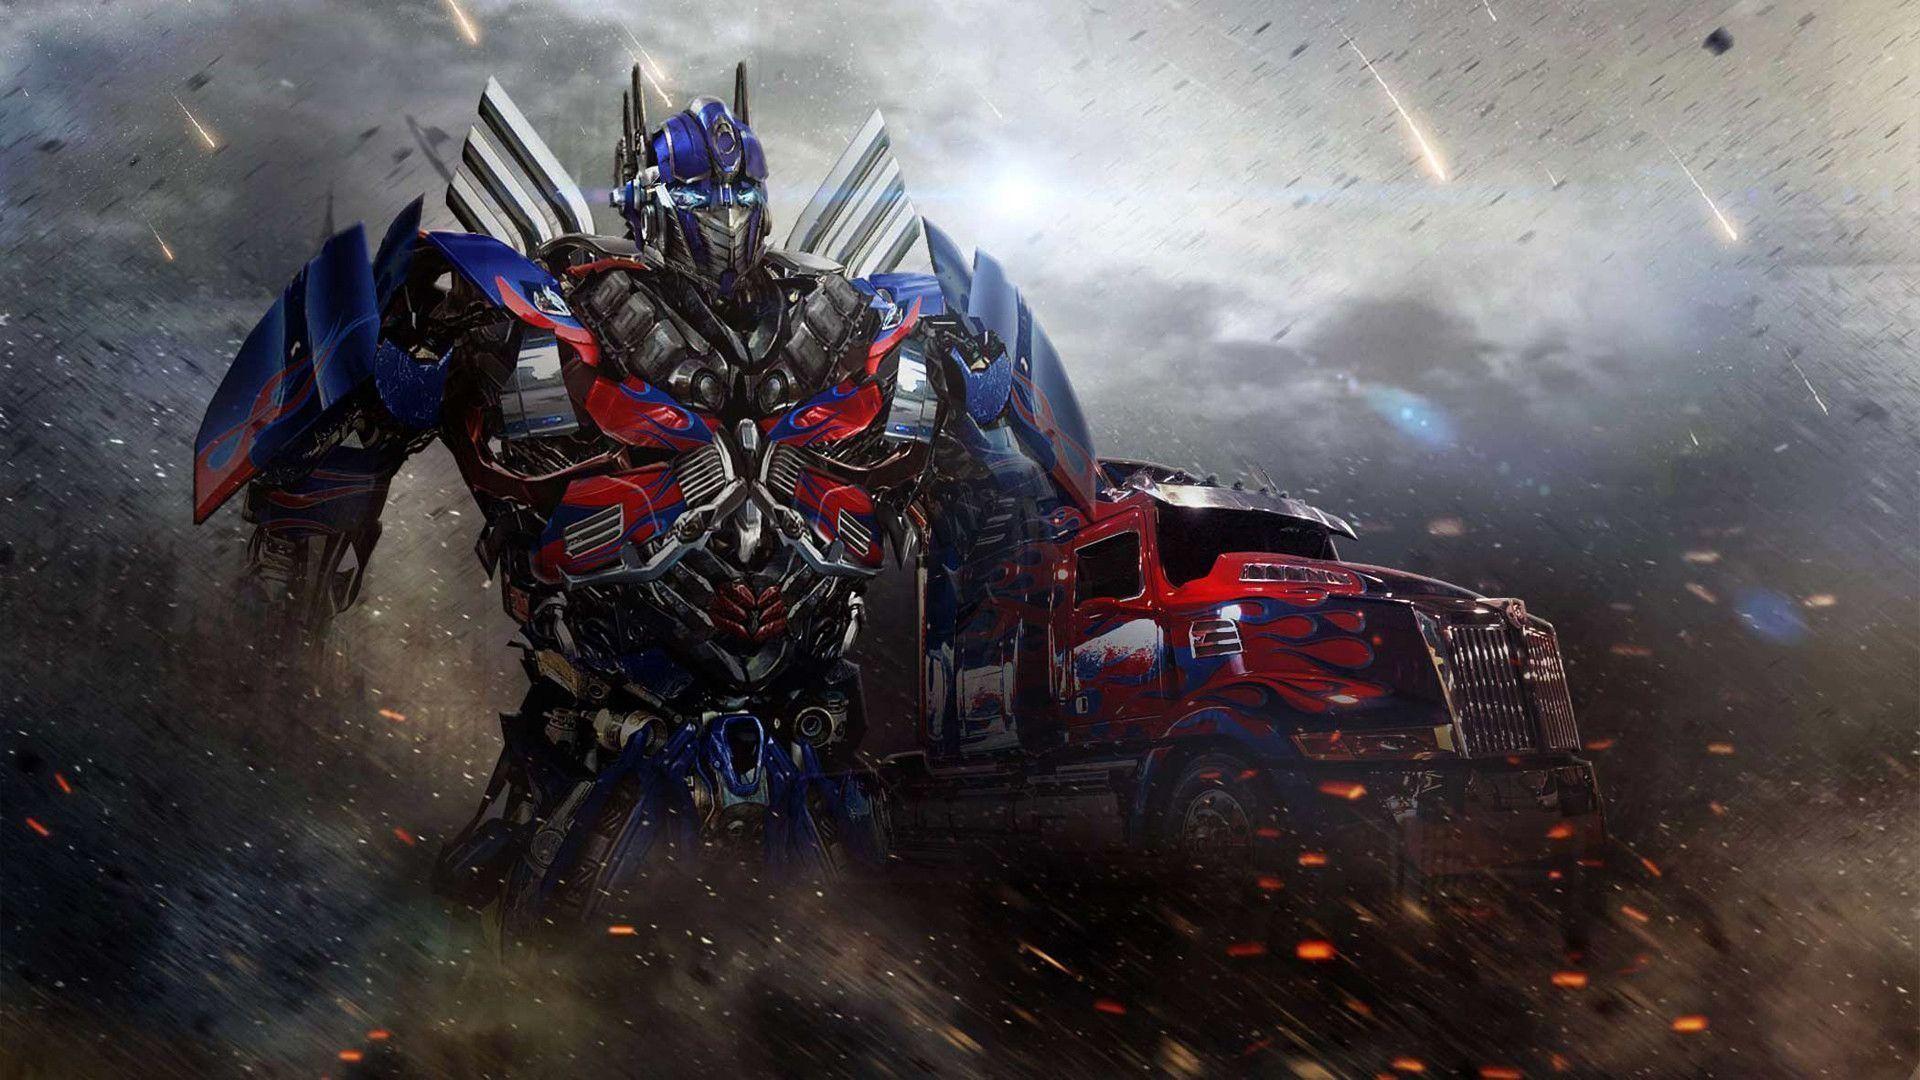 Optimus Prime Truck Wallpaper – Viewing Gallery